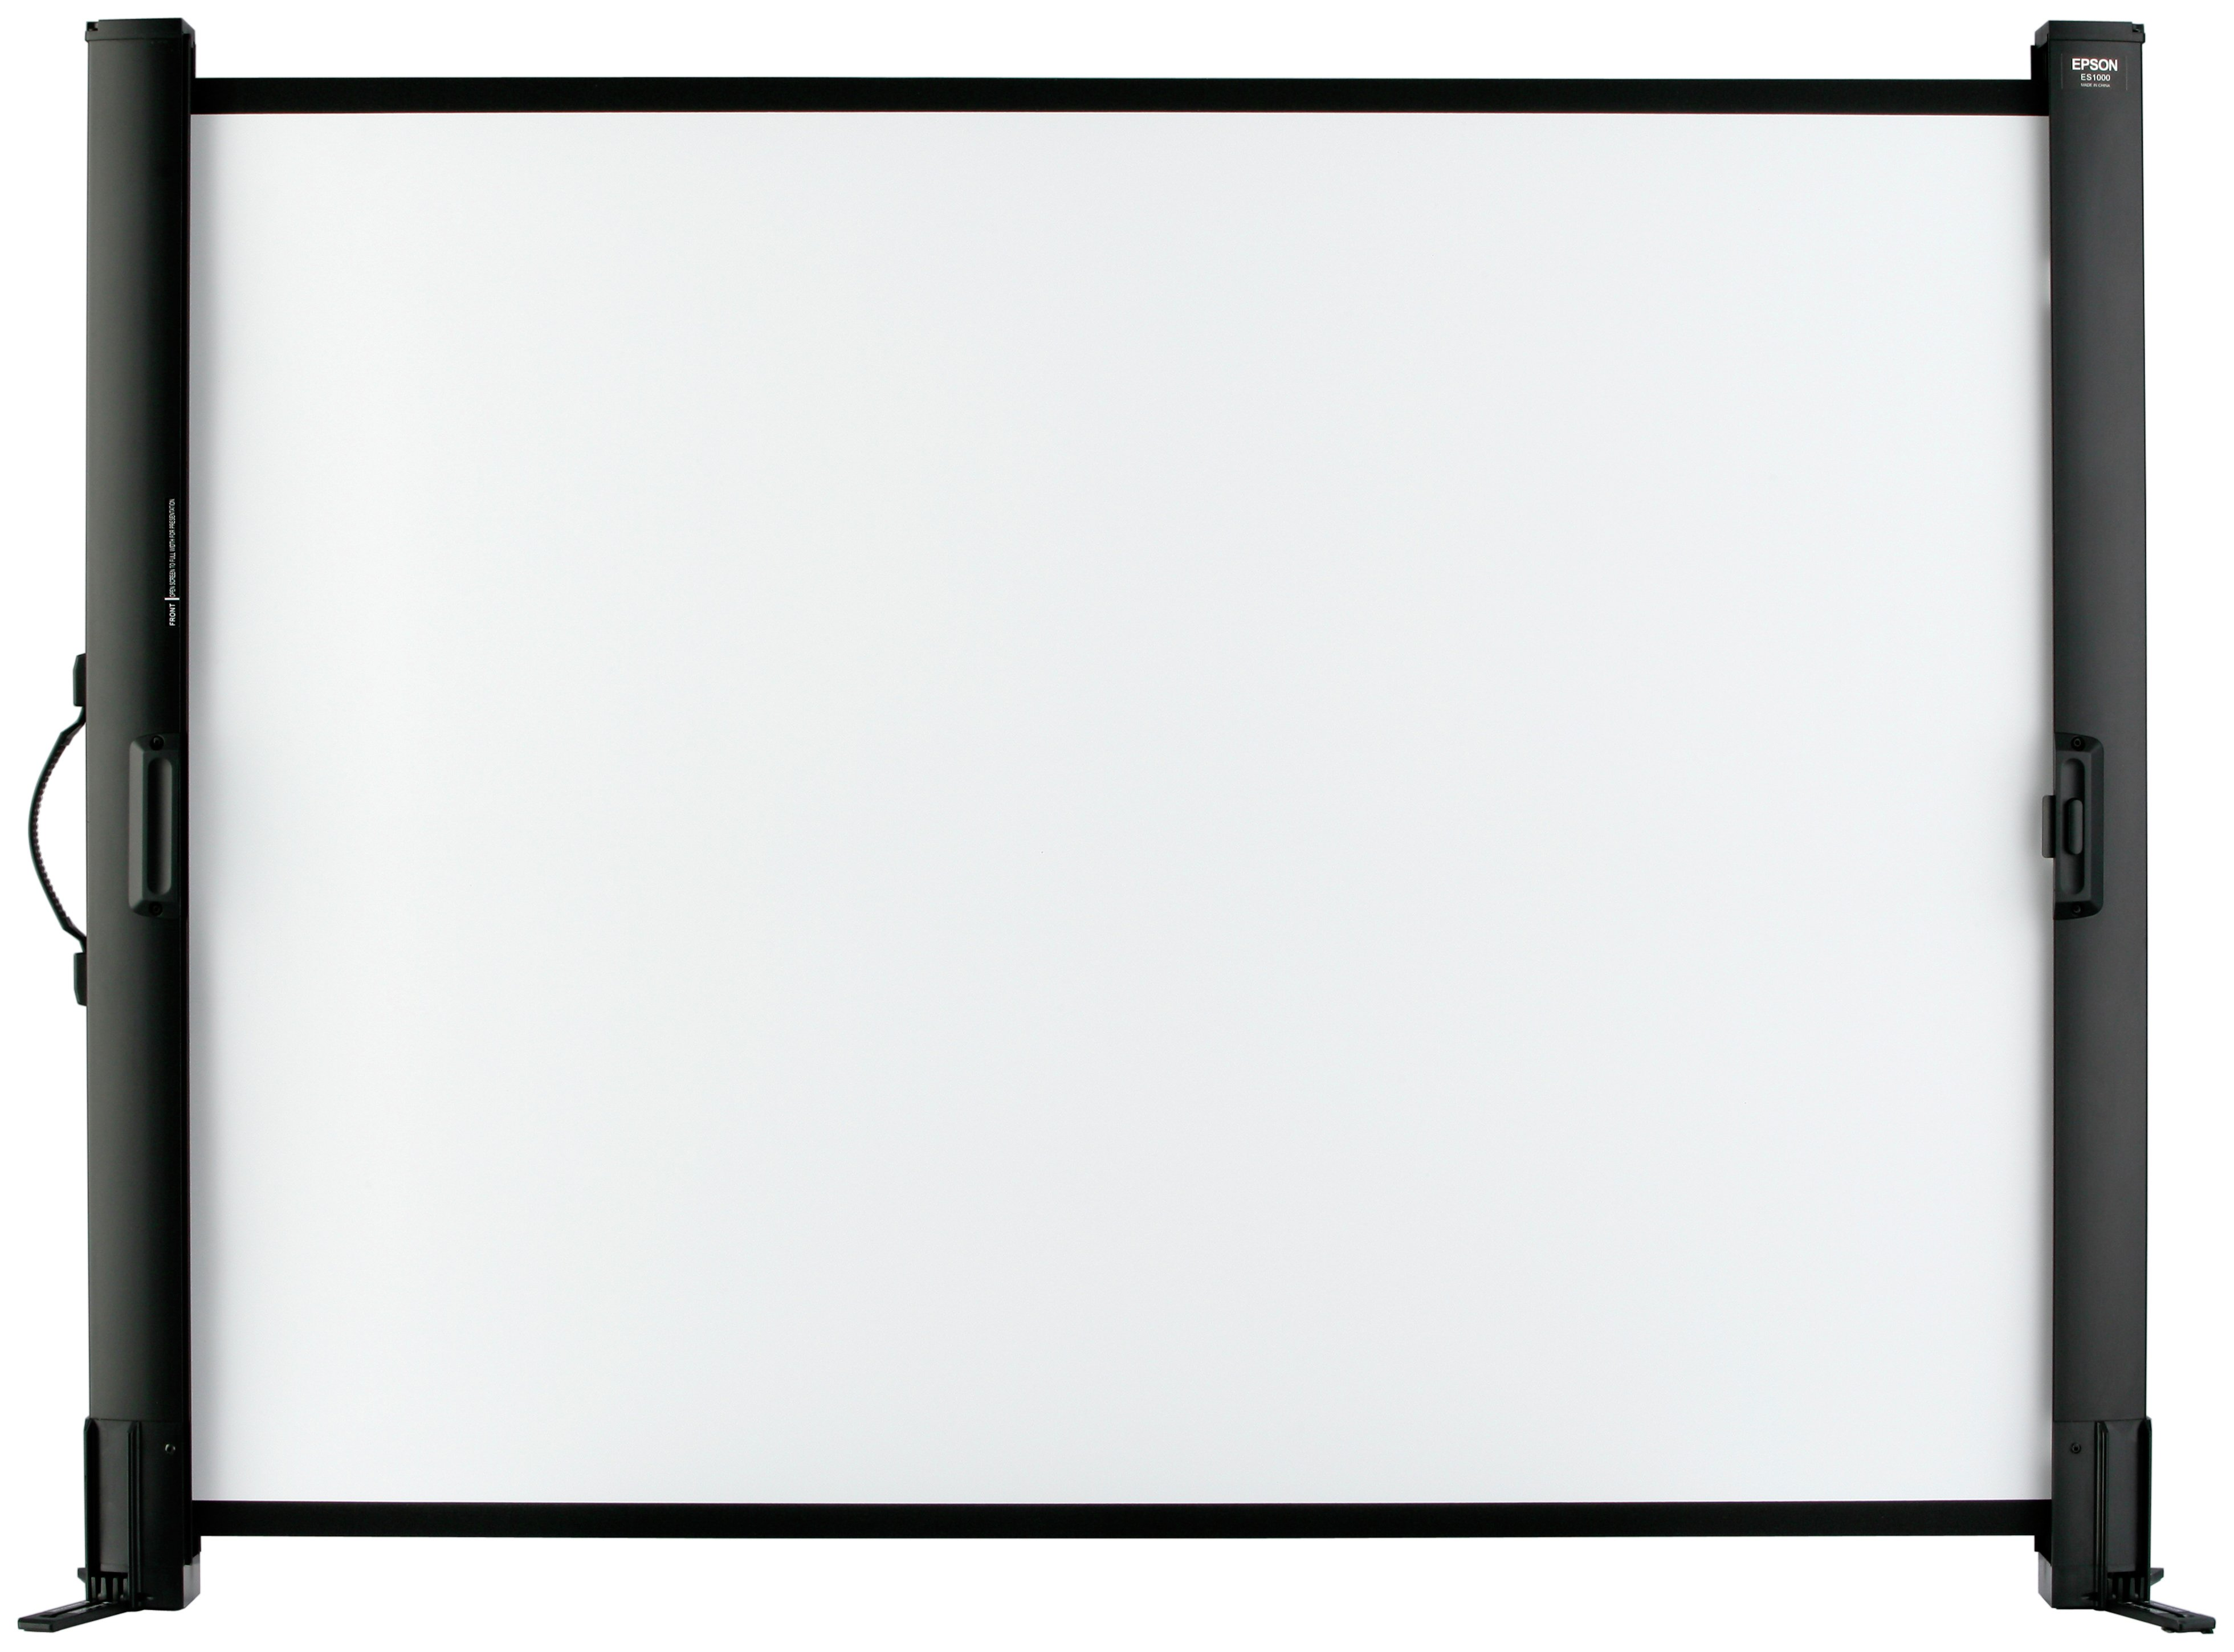 Image of Epson - 50-inch Desktop - Projector Screen (ELPSC32)